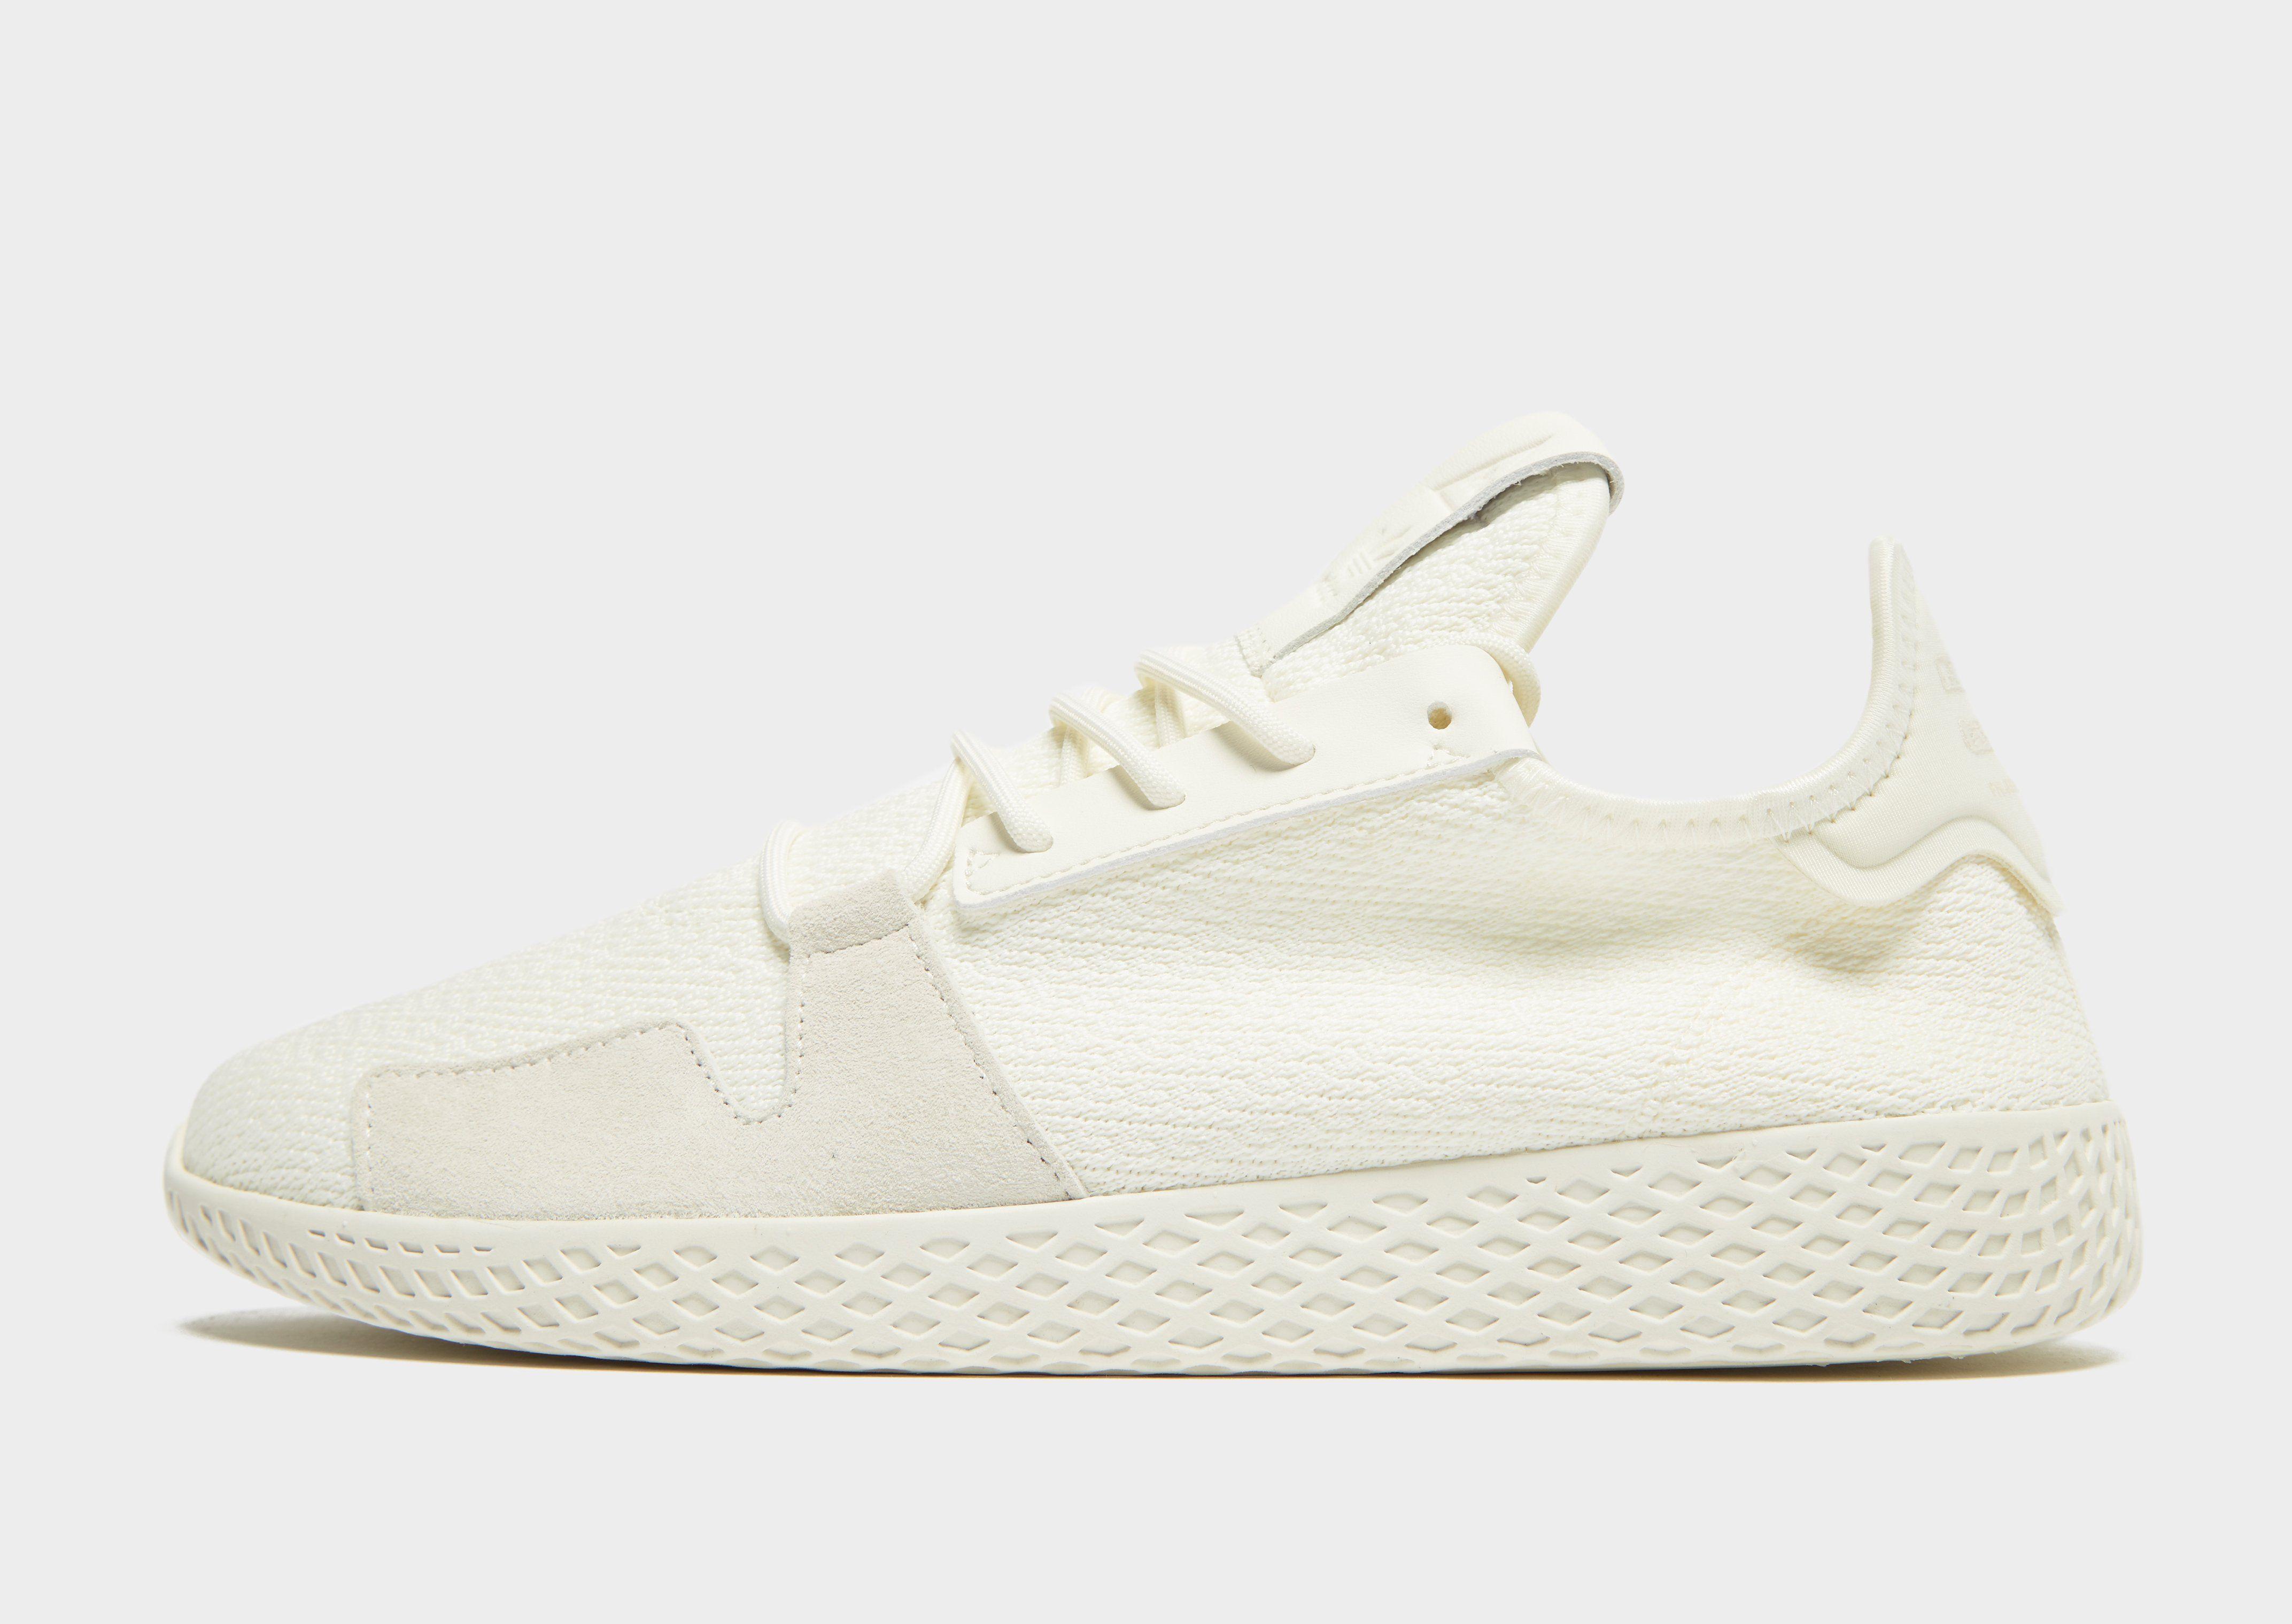 3d51d9501 adidas Originals x Pharrell Williams Tennis Hu V2